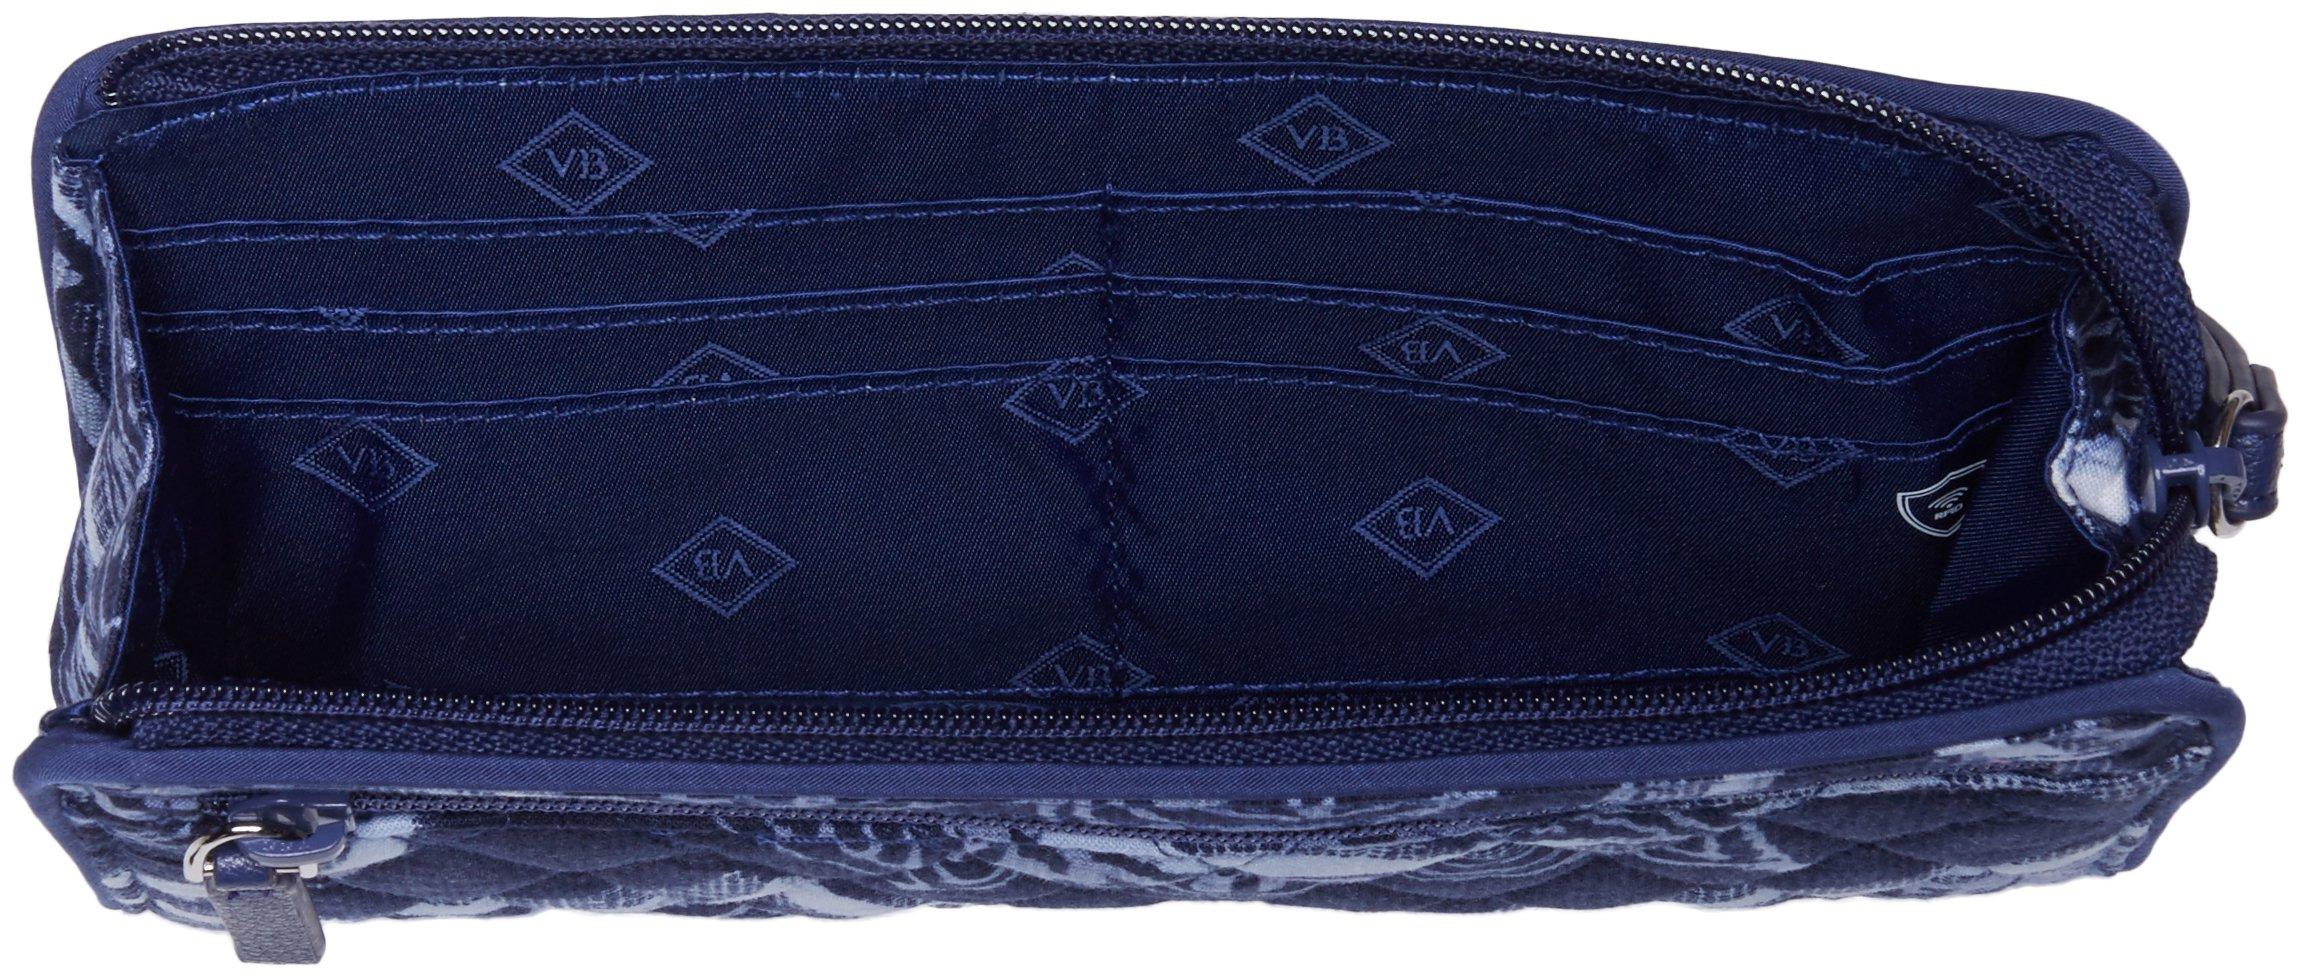 Vera Bradley Rfid Front Zip Wristlet, Signature Cotton,One Size,Indigo by Vera Bradley (Image #4)